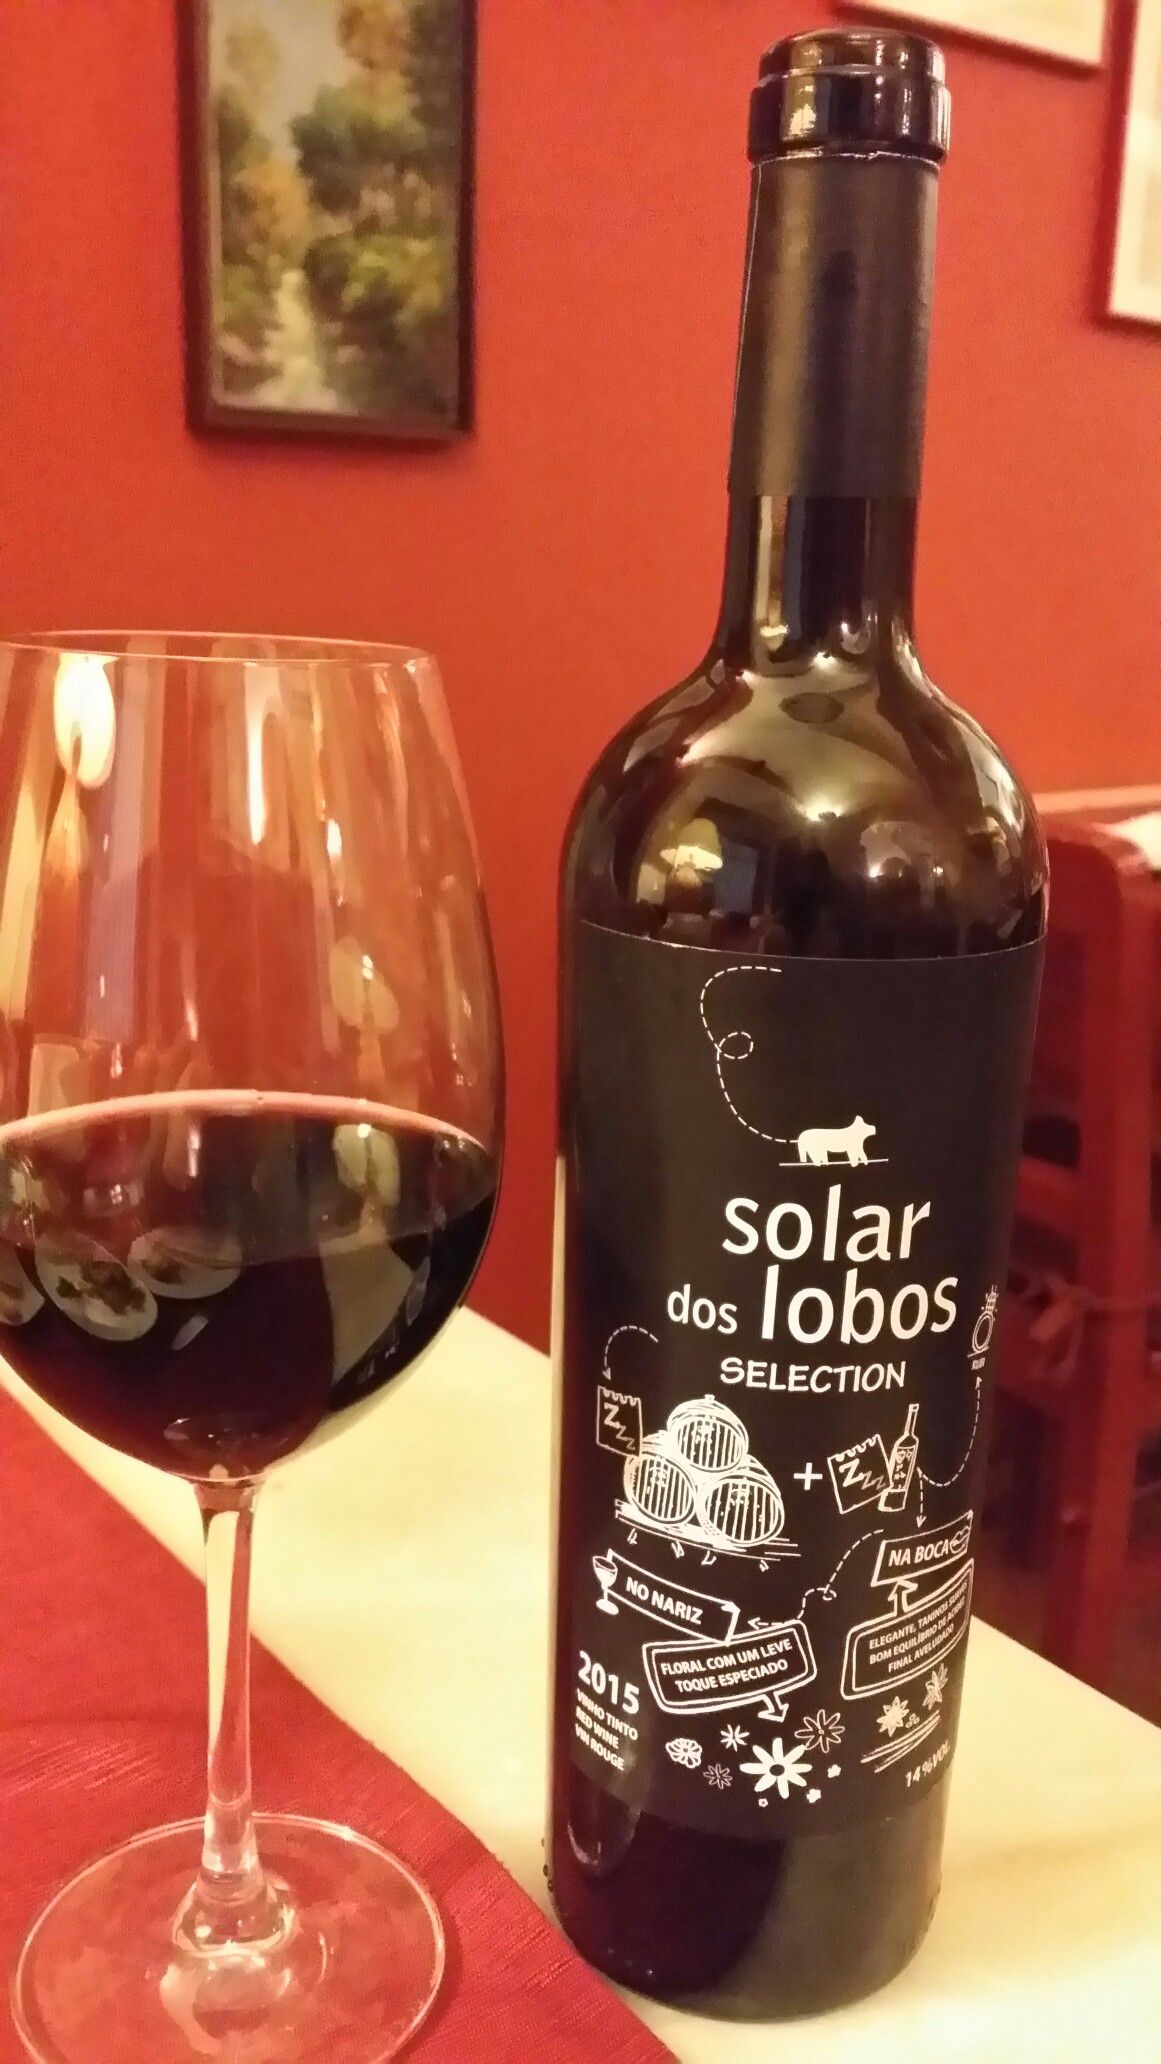 Red Wine Solar Dos Lobos 2015 Alentejo Alcoholic Drinks Alcohol Red Wine